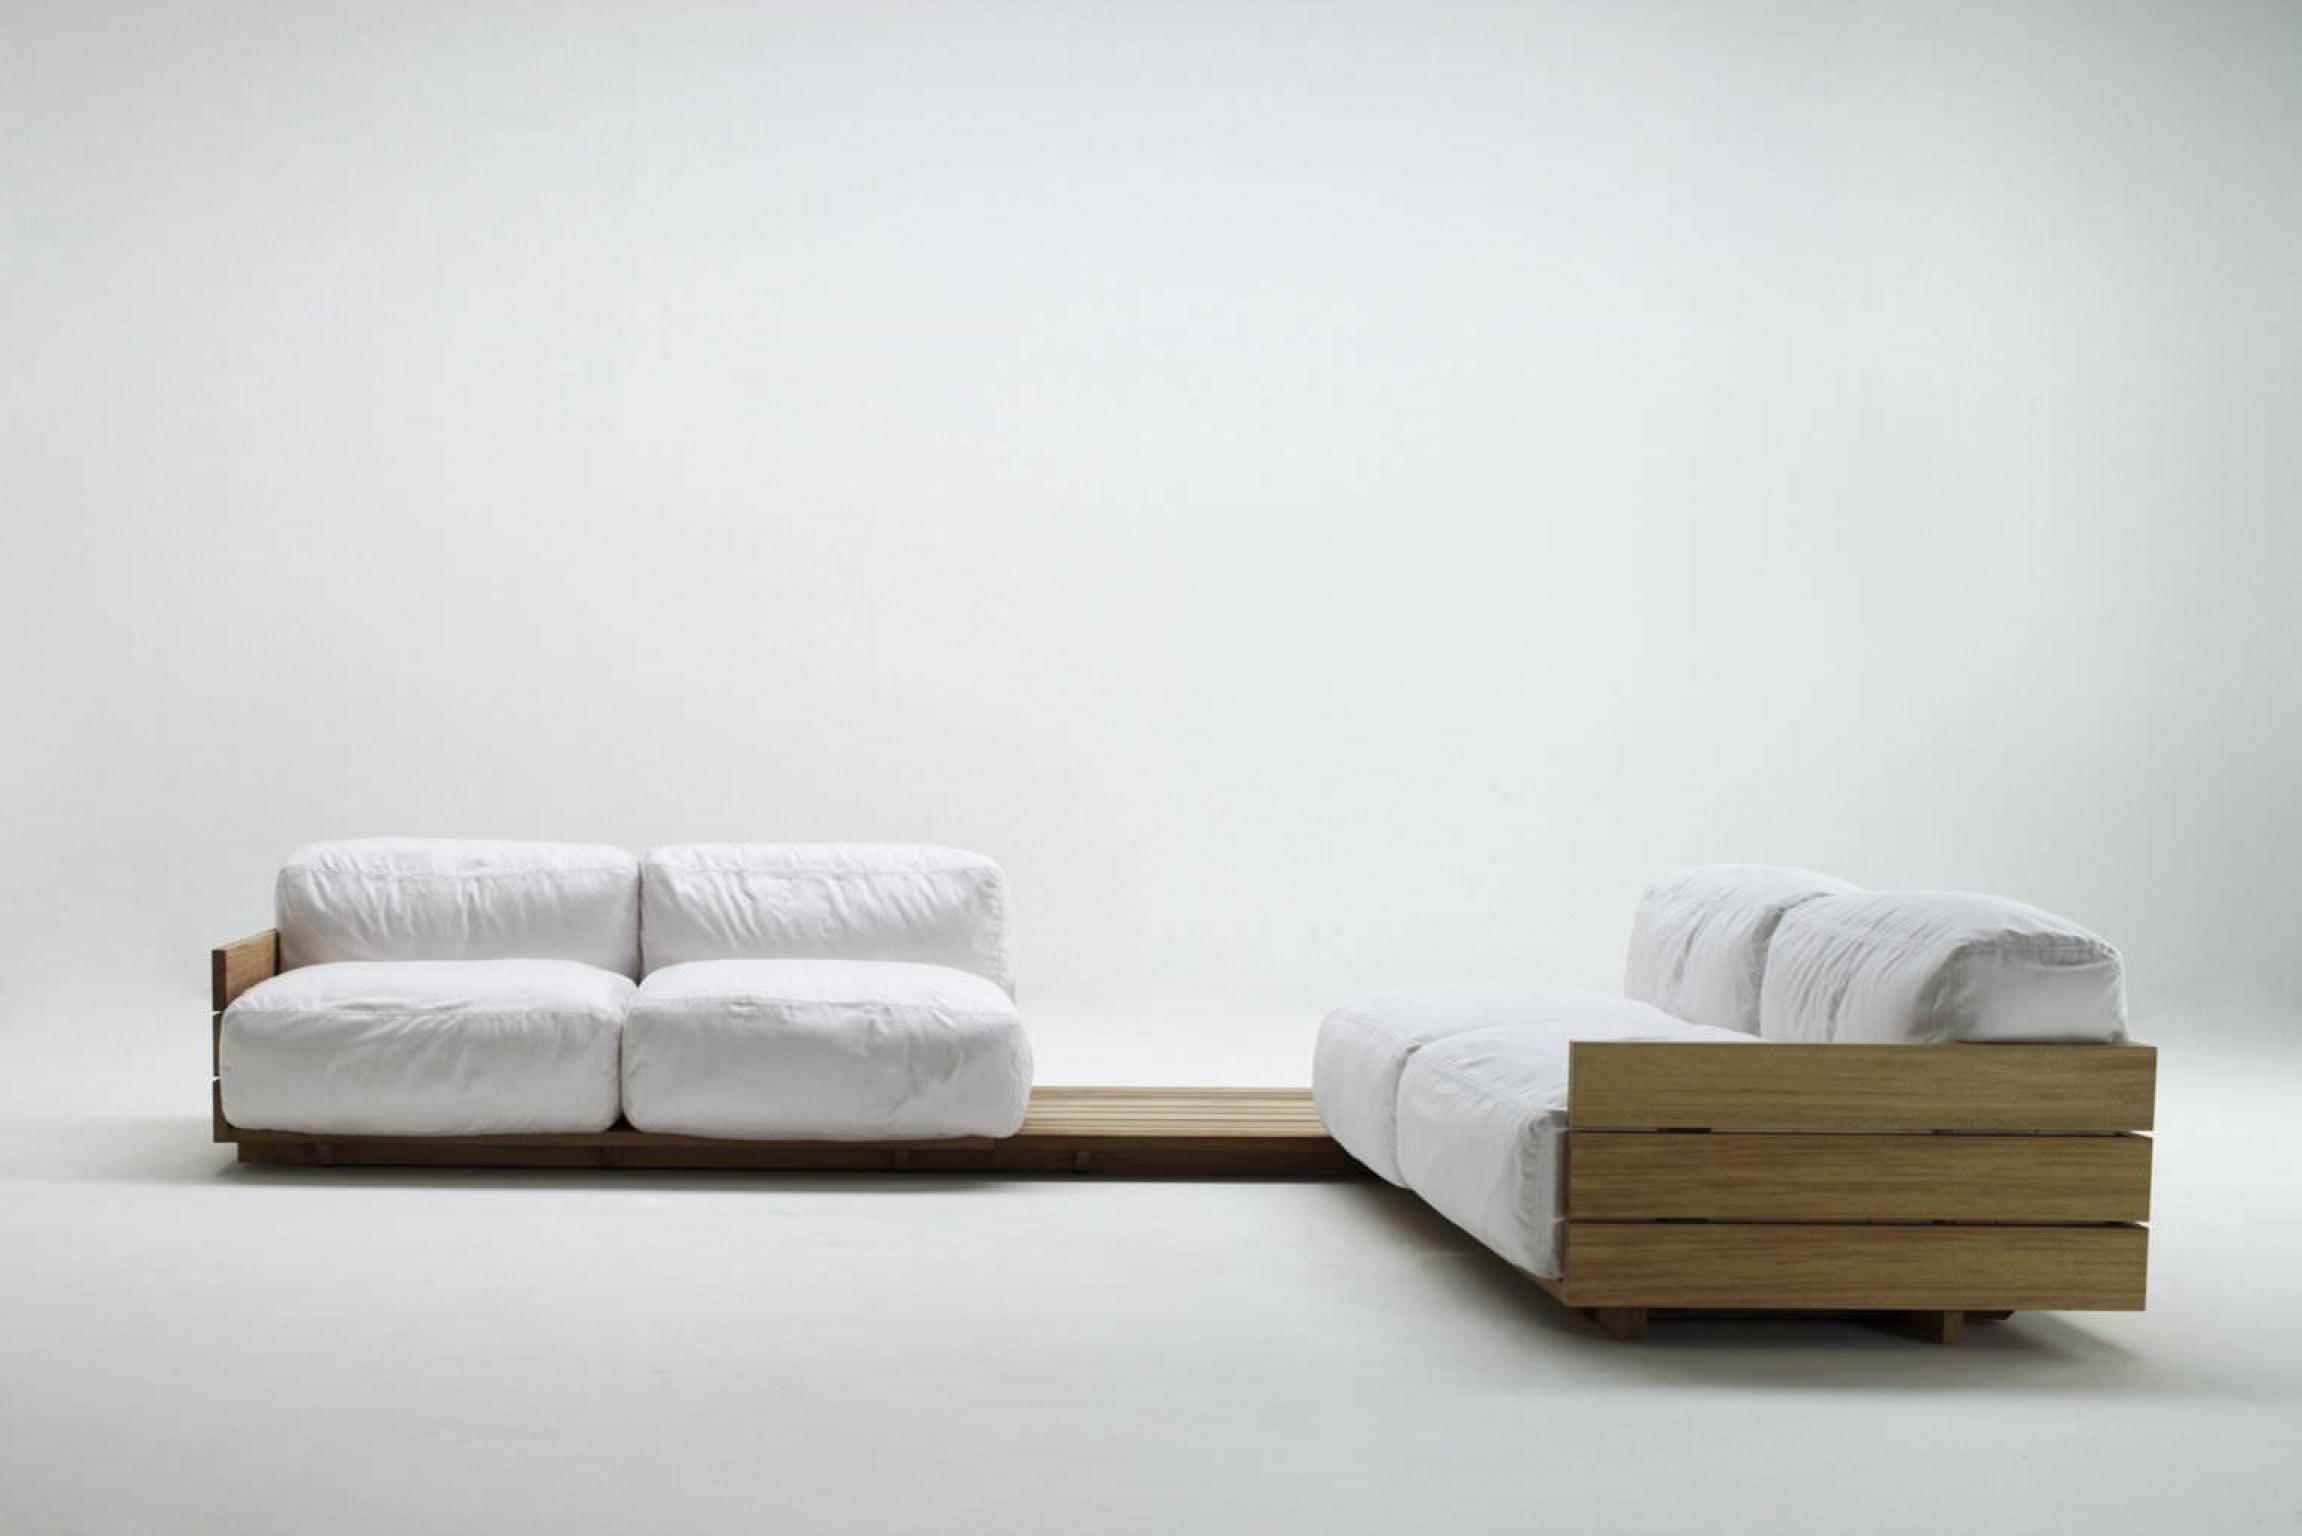 photos canap palette. Black Bedroom Furniture Sets. Home Design Ideas